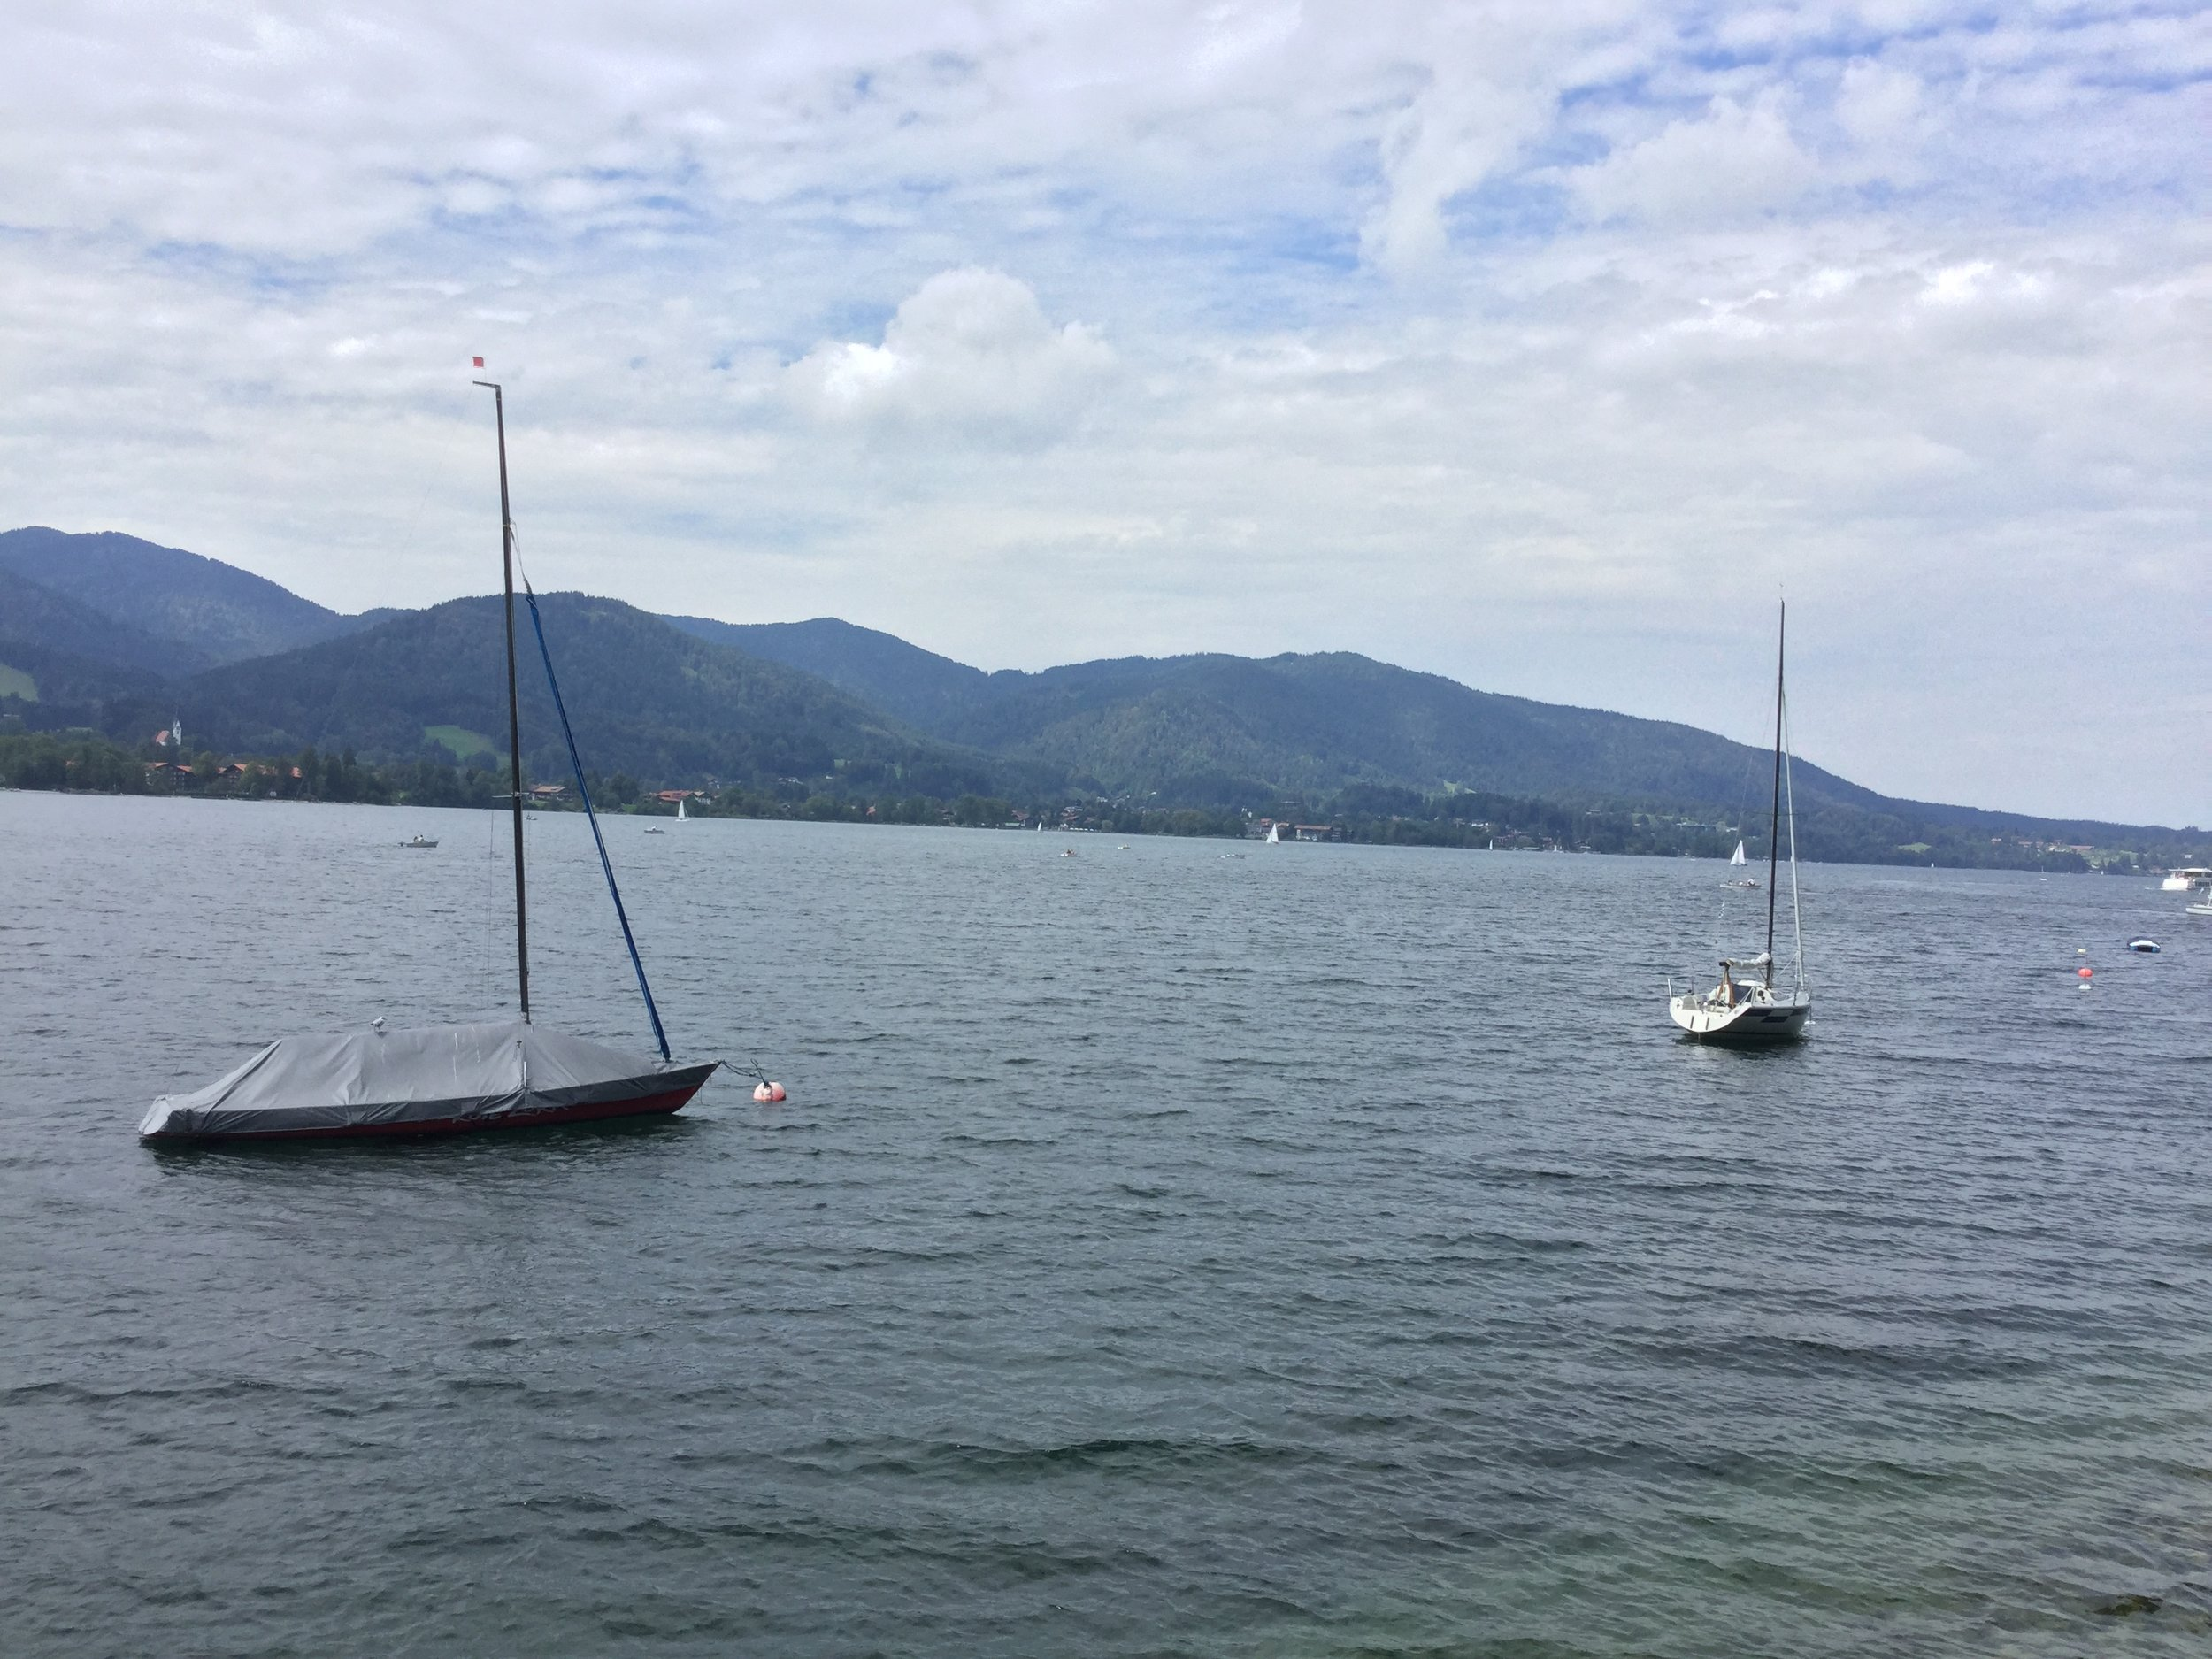 annaporter-travel-tegernsee-lake-bavaria-germany-2